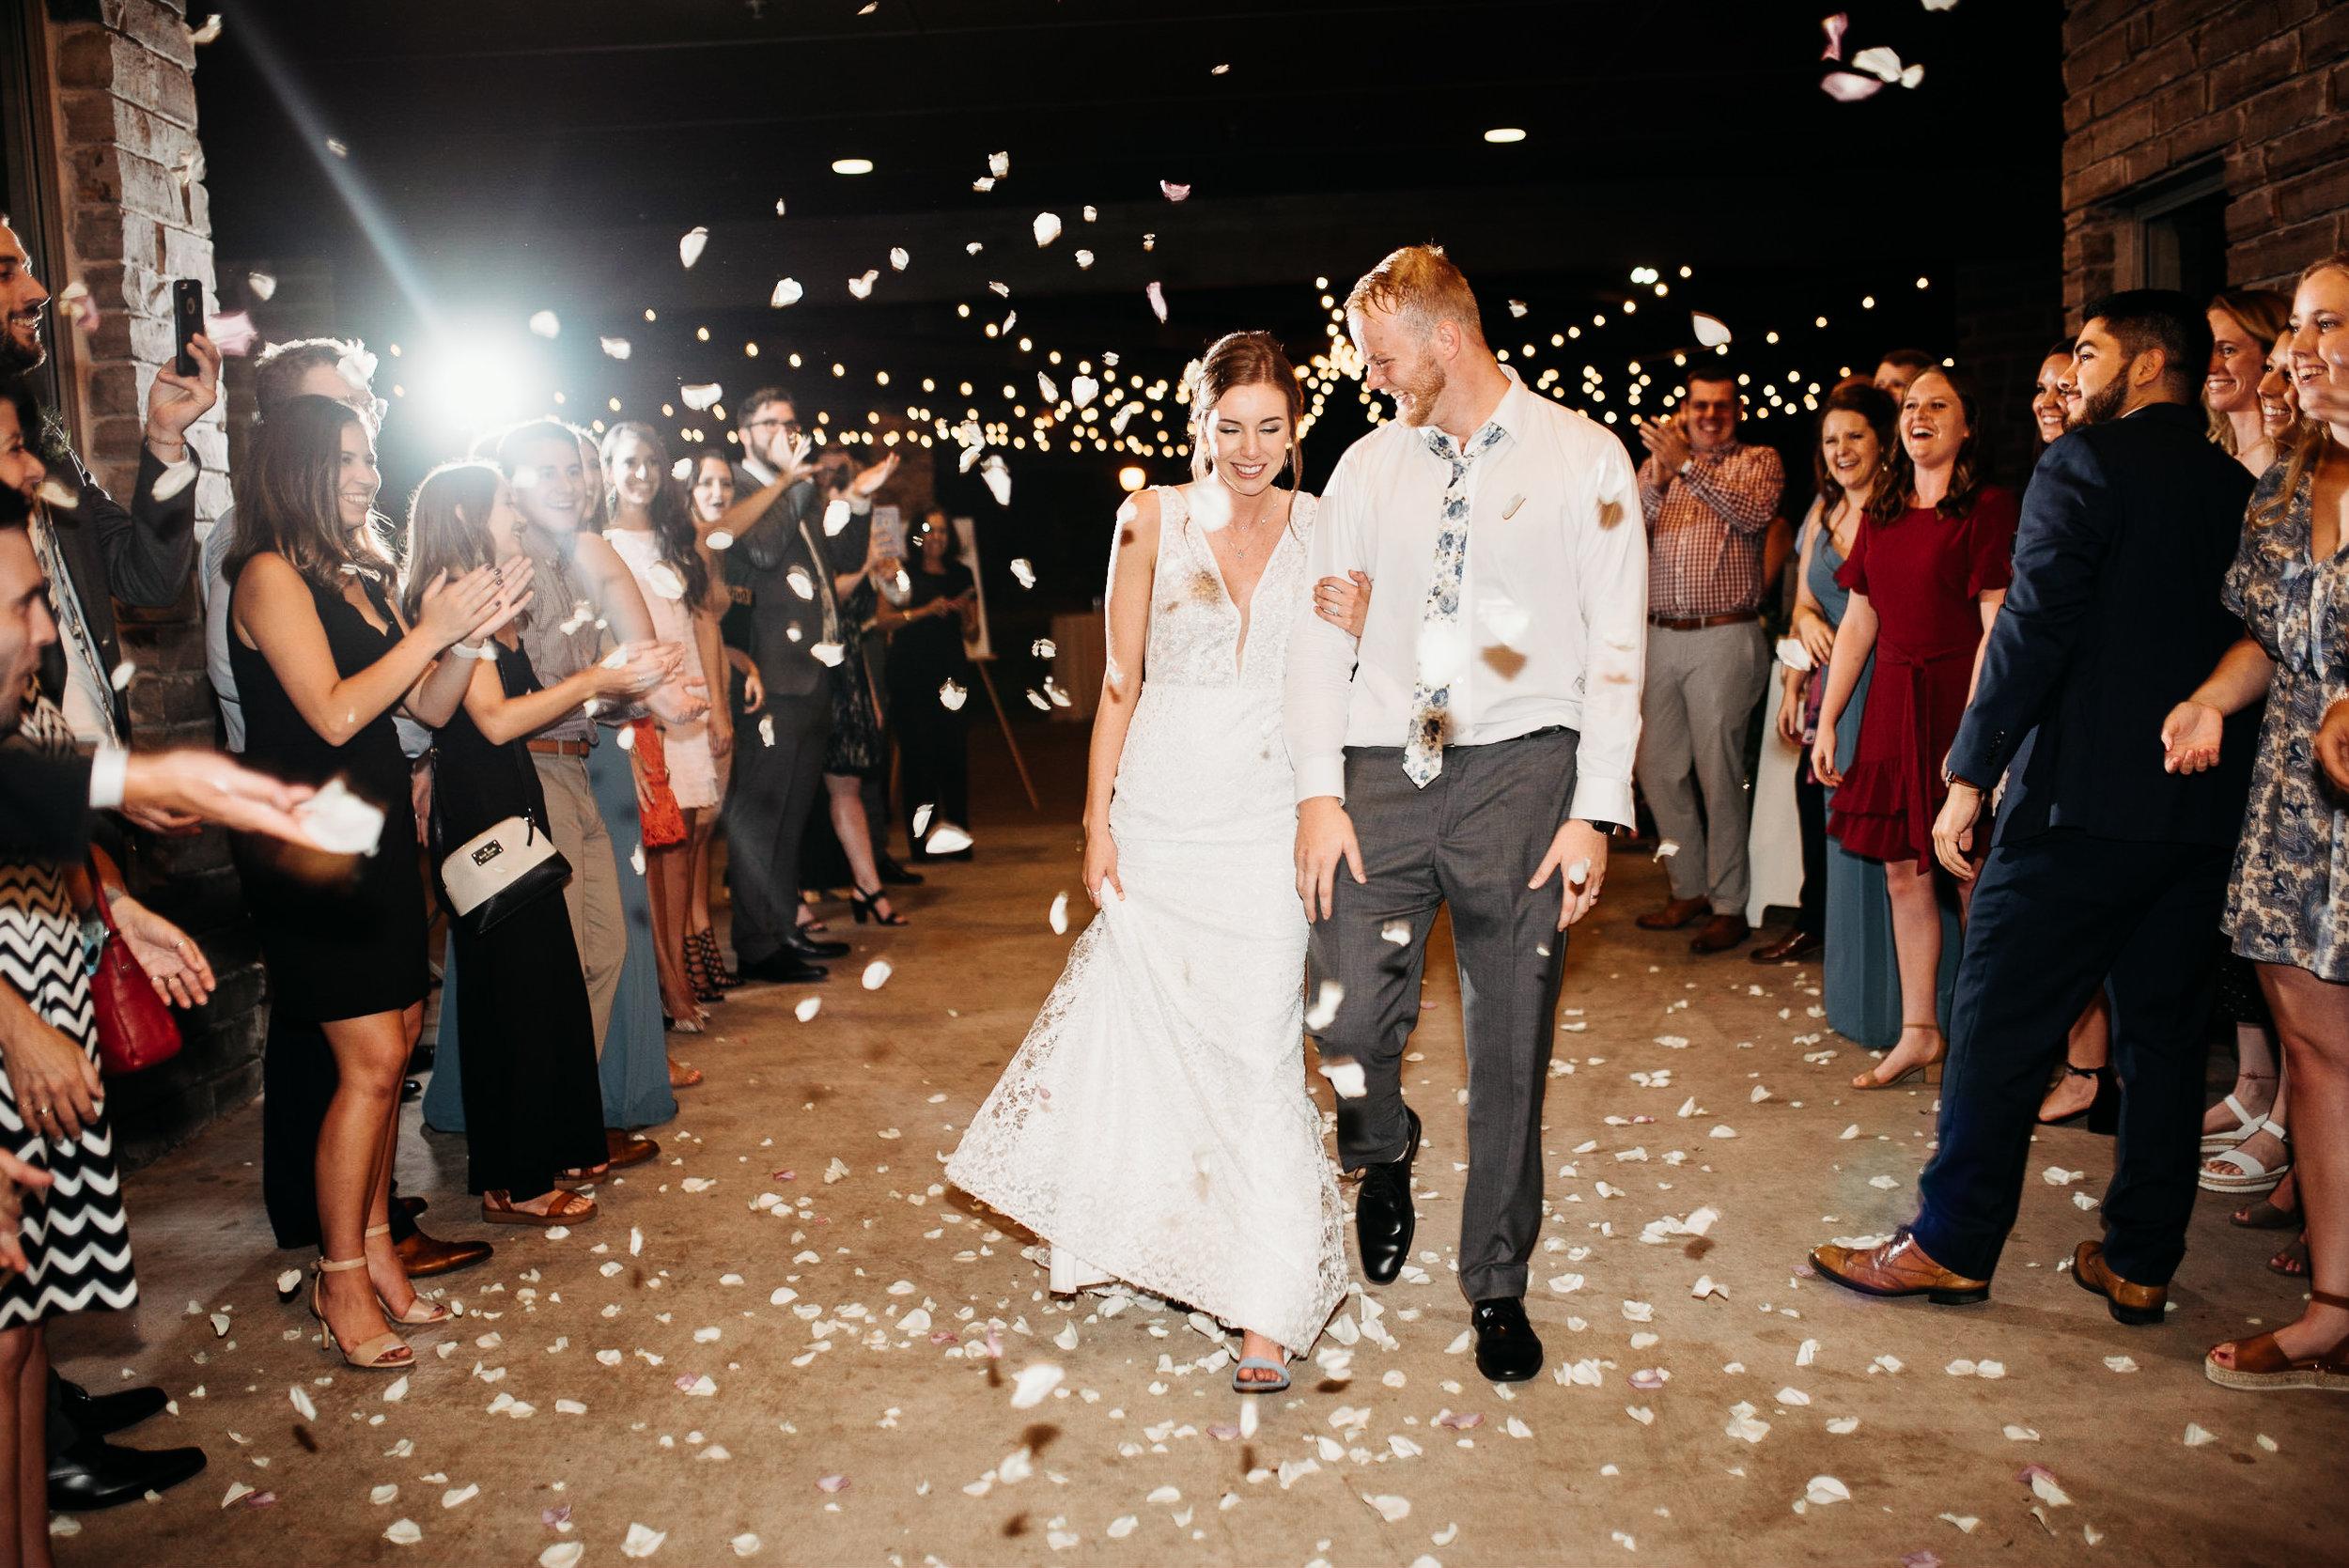 okc-wedding-photographer-coles-garden-wedding-okc-best-wedding-photographers-197.jpg